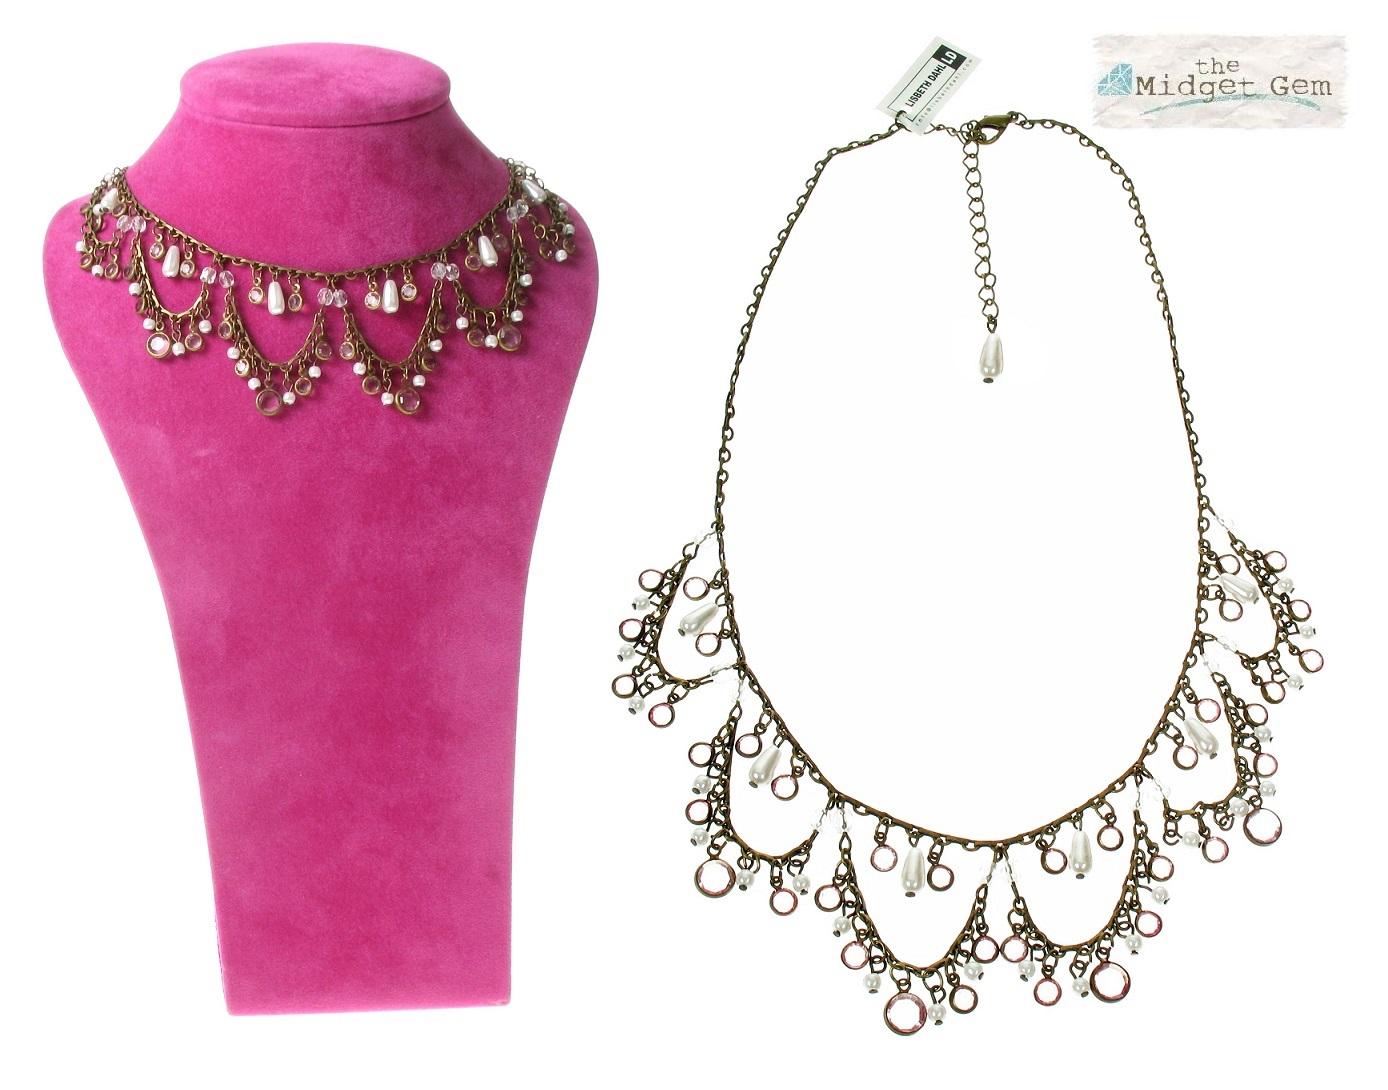 Lisbeth Dahl - Pearl Drops Necklace - Vintage Gold/Pale Pink BNWT